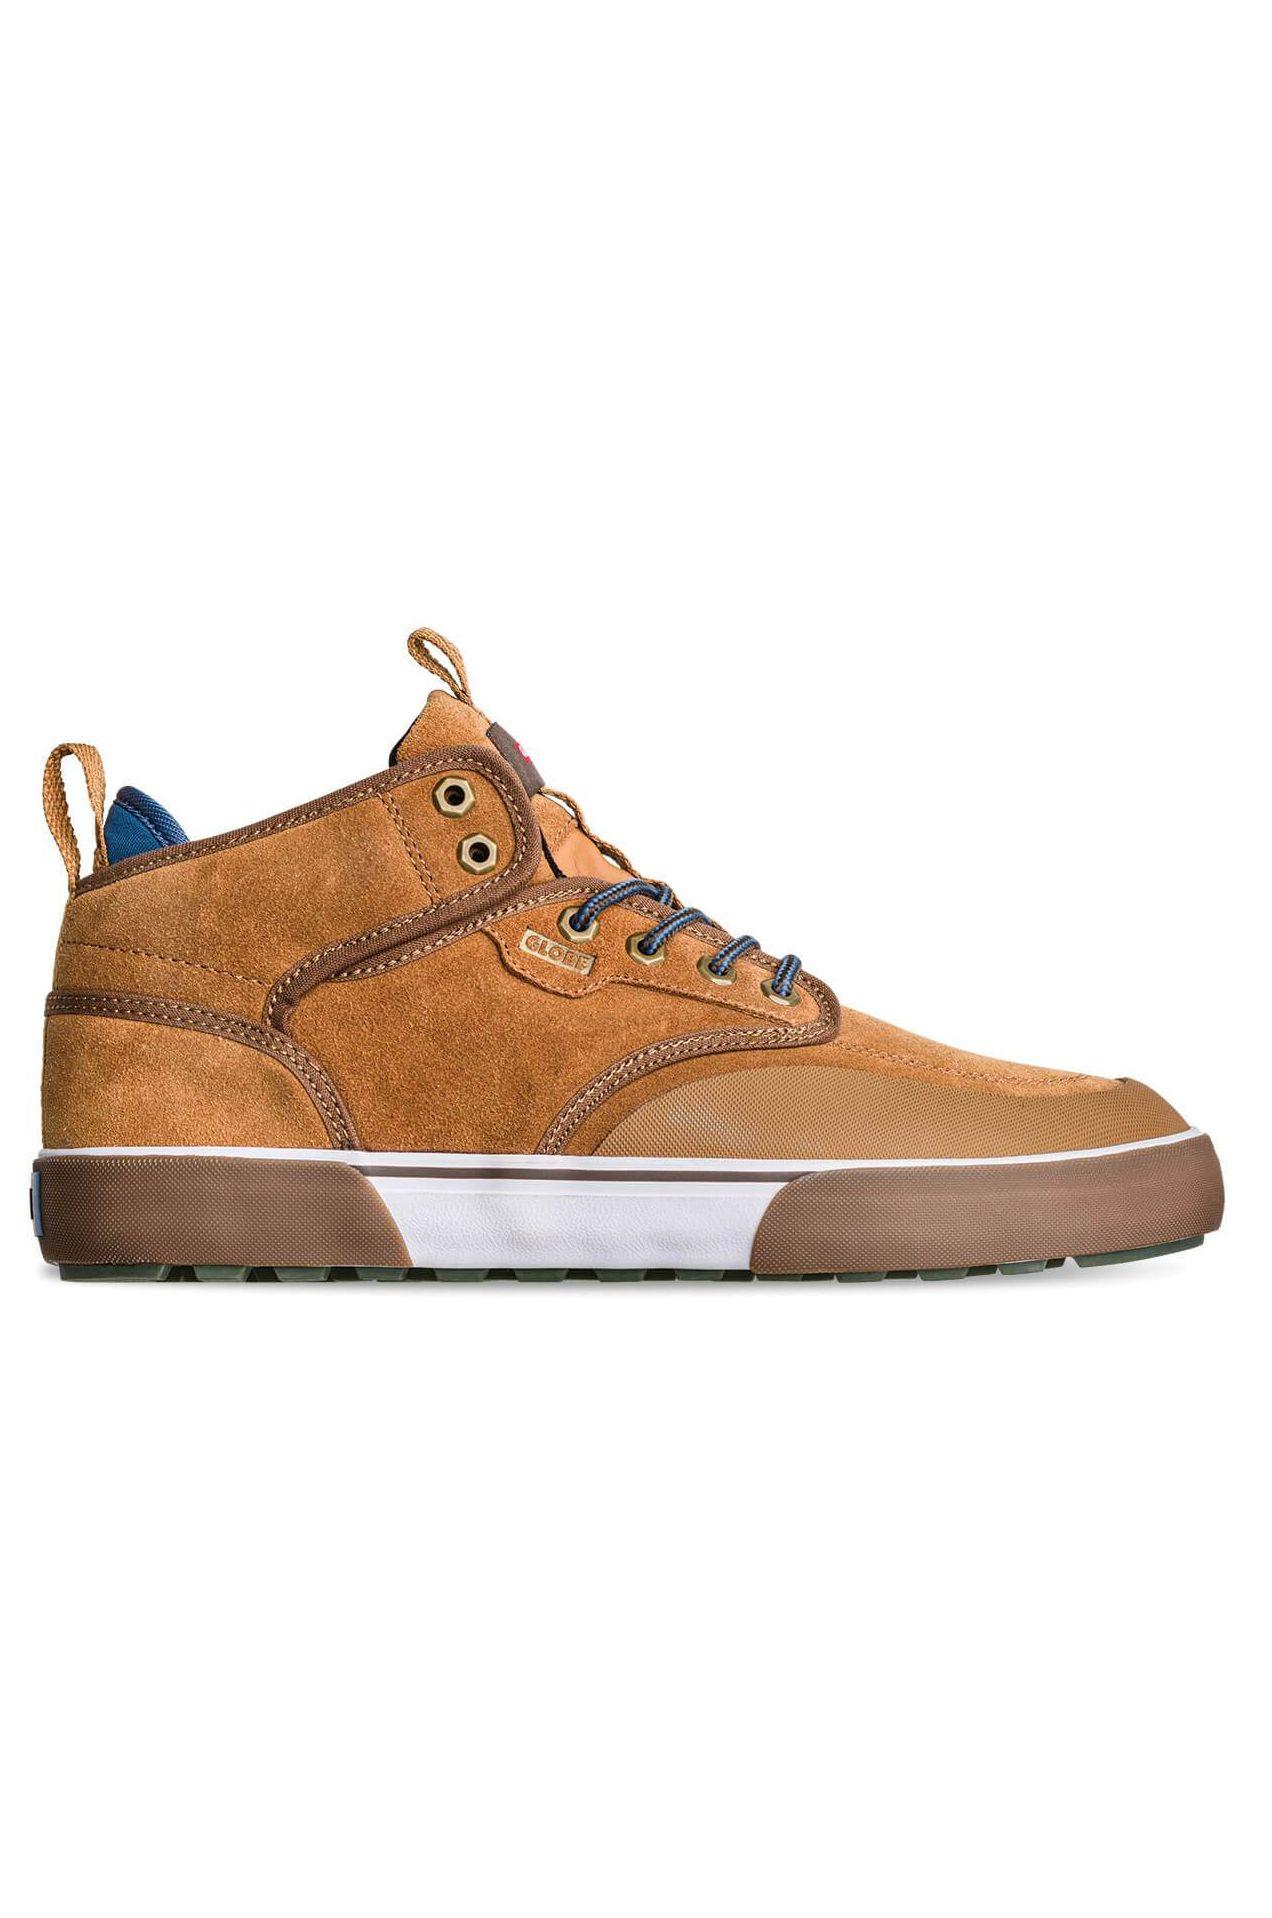 Globe Shoes MOTLEY MID Caramello/Summit